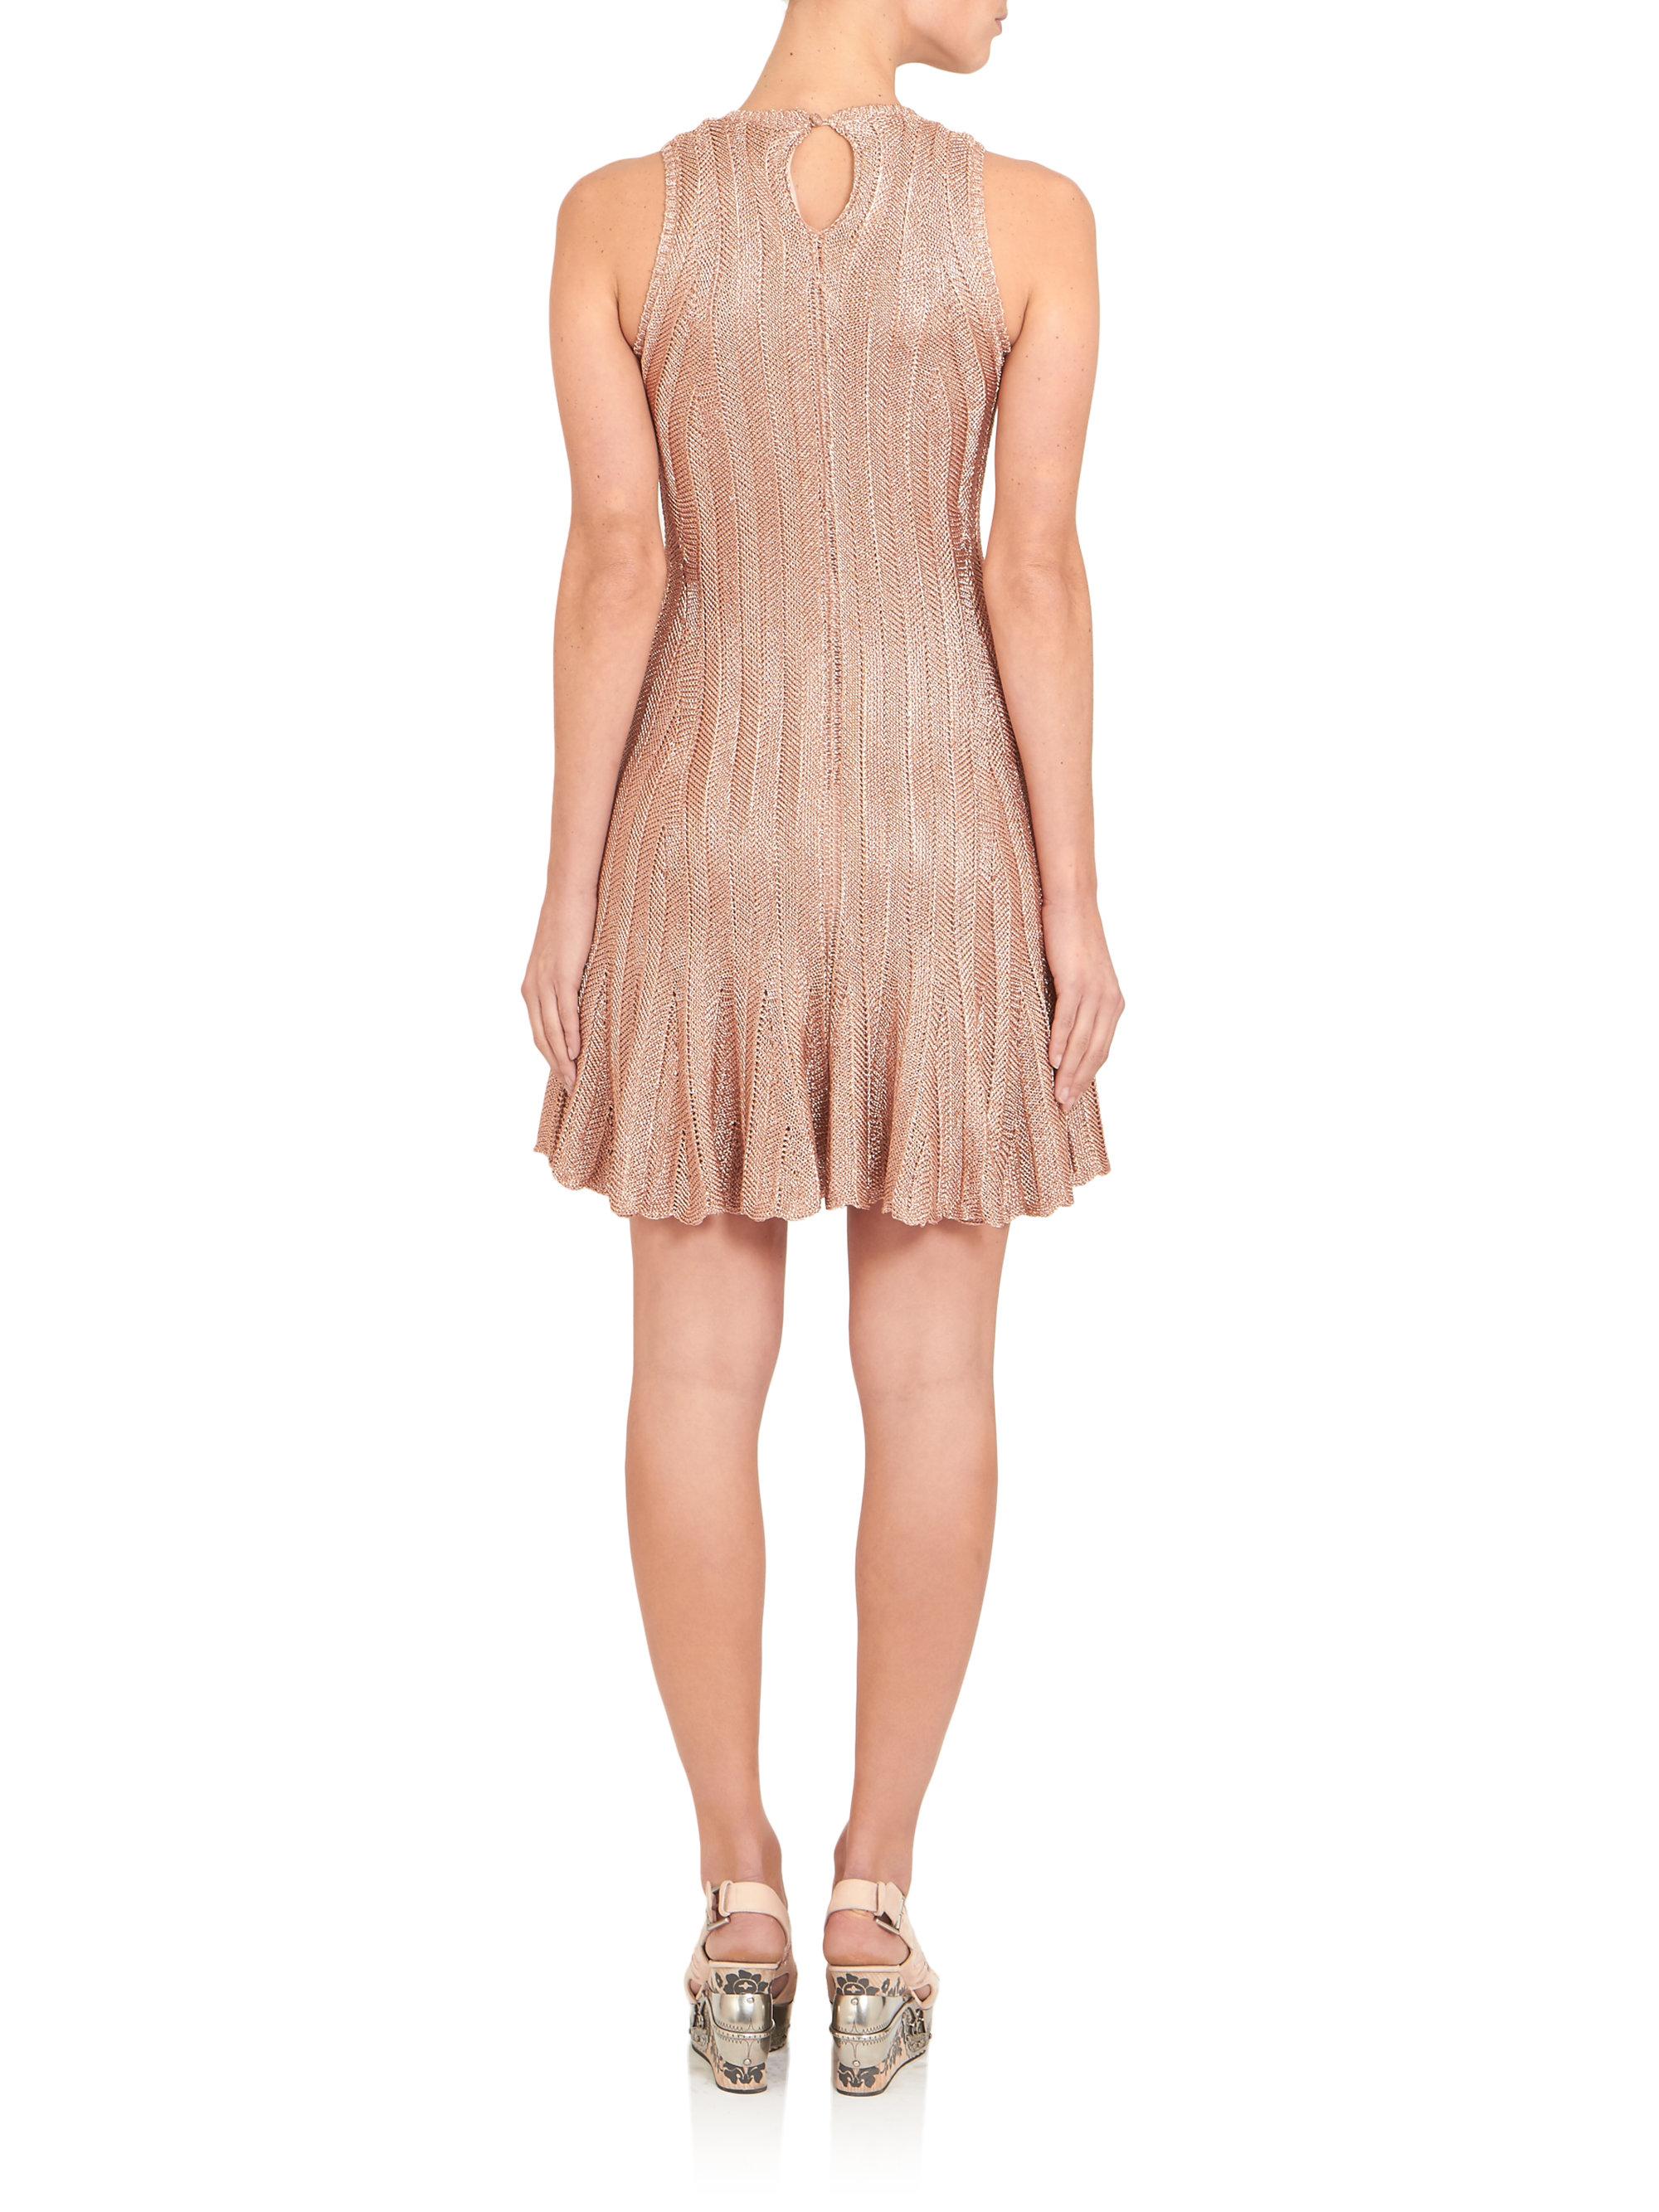 Alexander mcqueen Metallic Knit Dress in Pink | Lyst